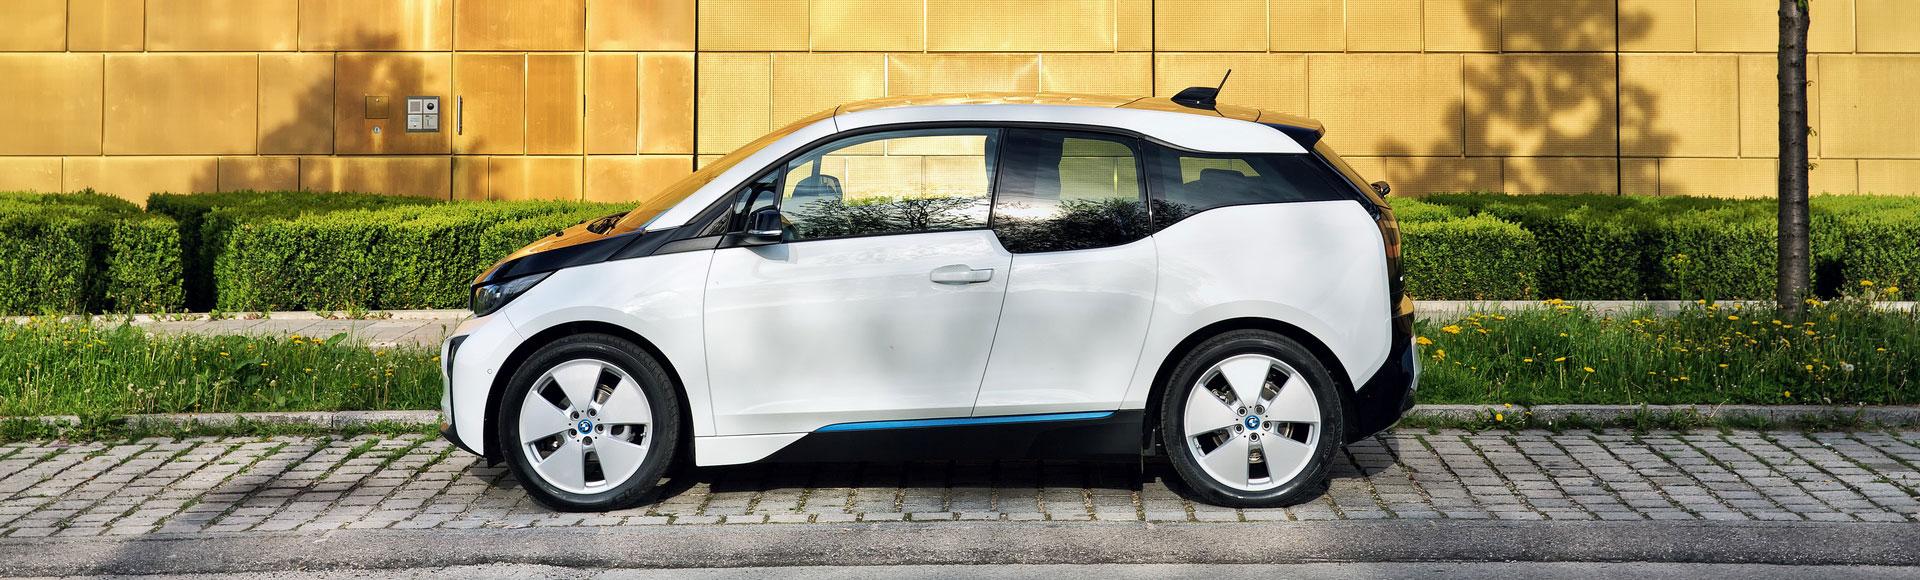 BMW i3 2015 Sommer 142